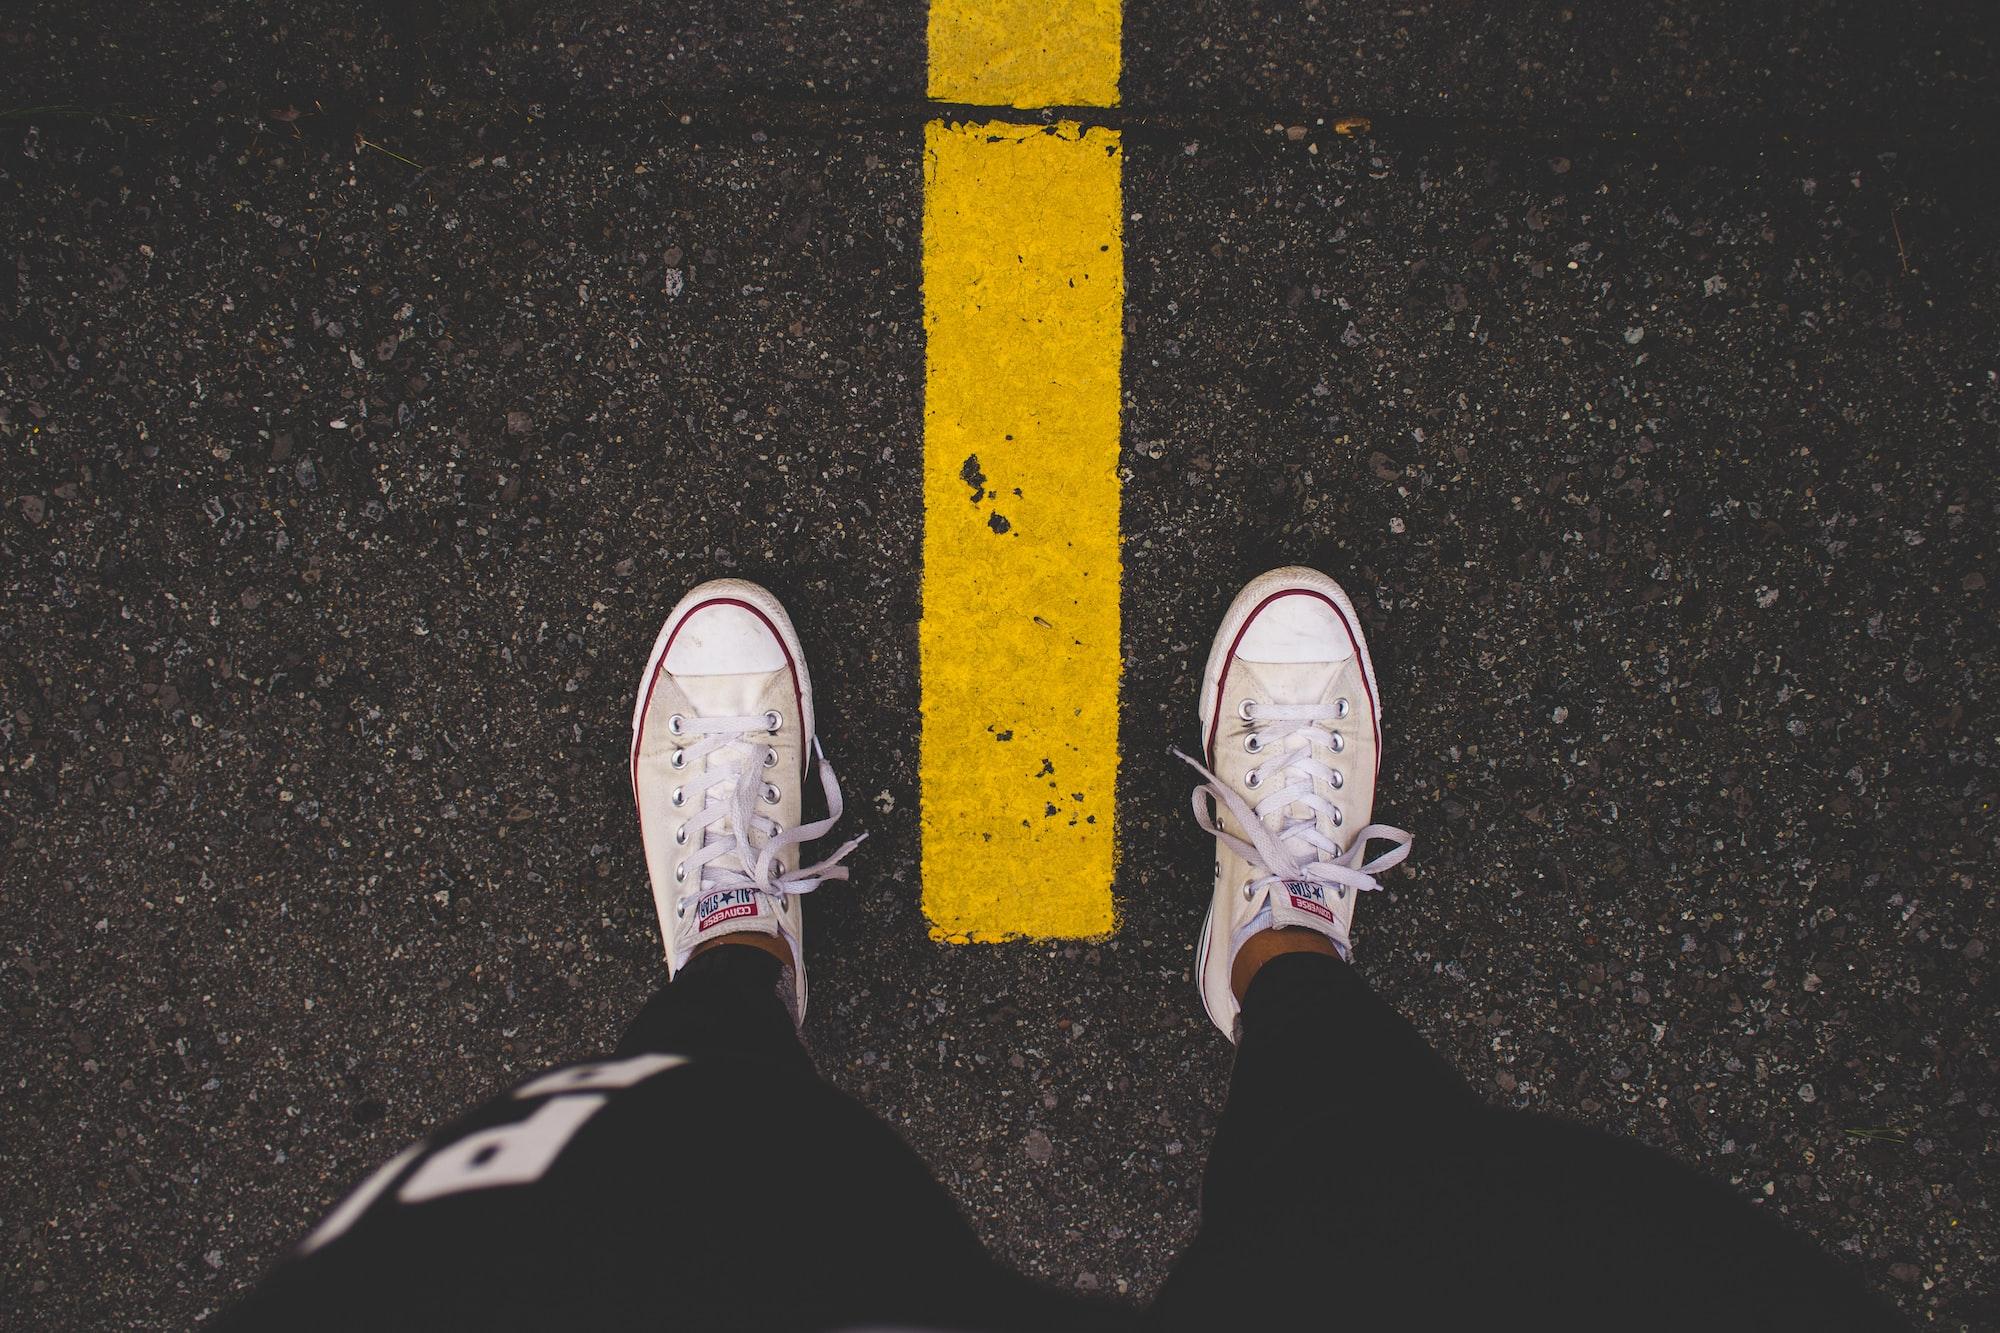 Standing over street lines